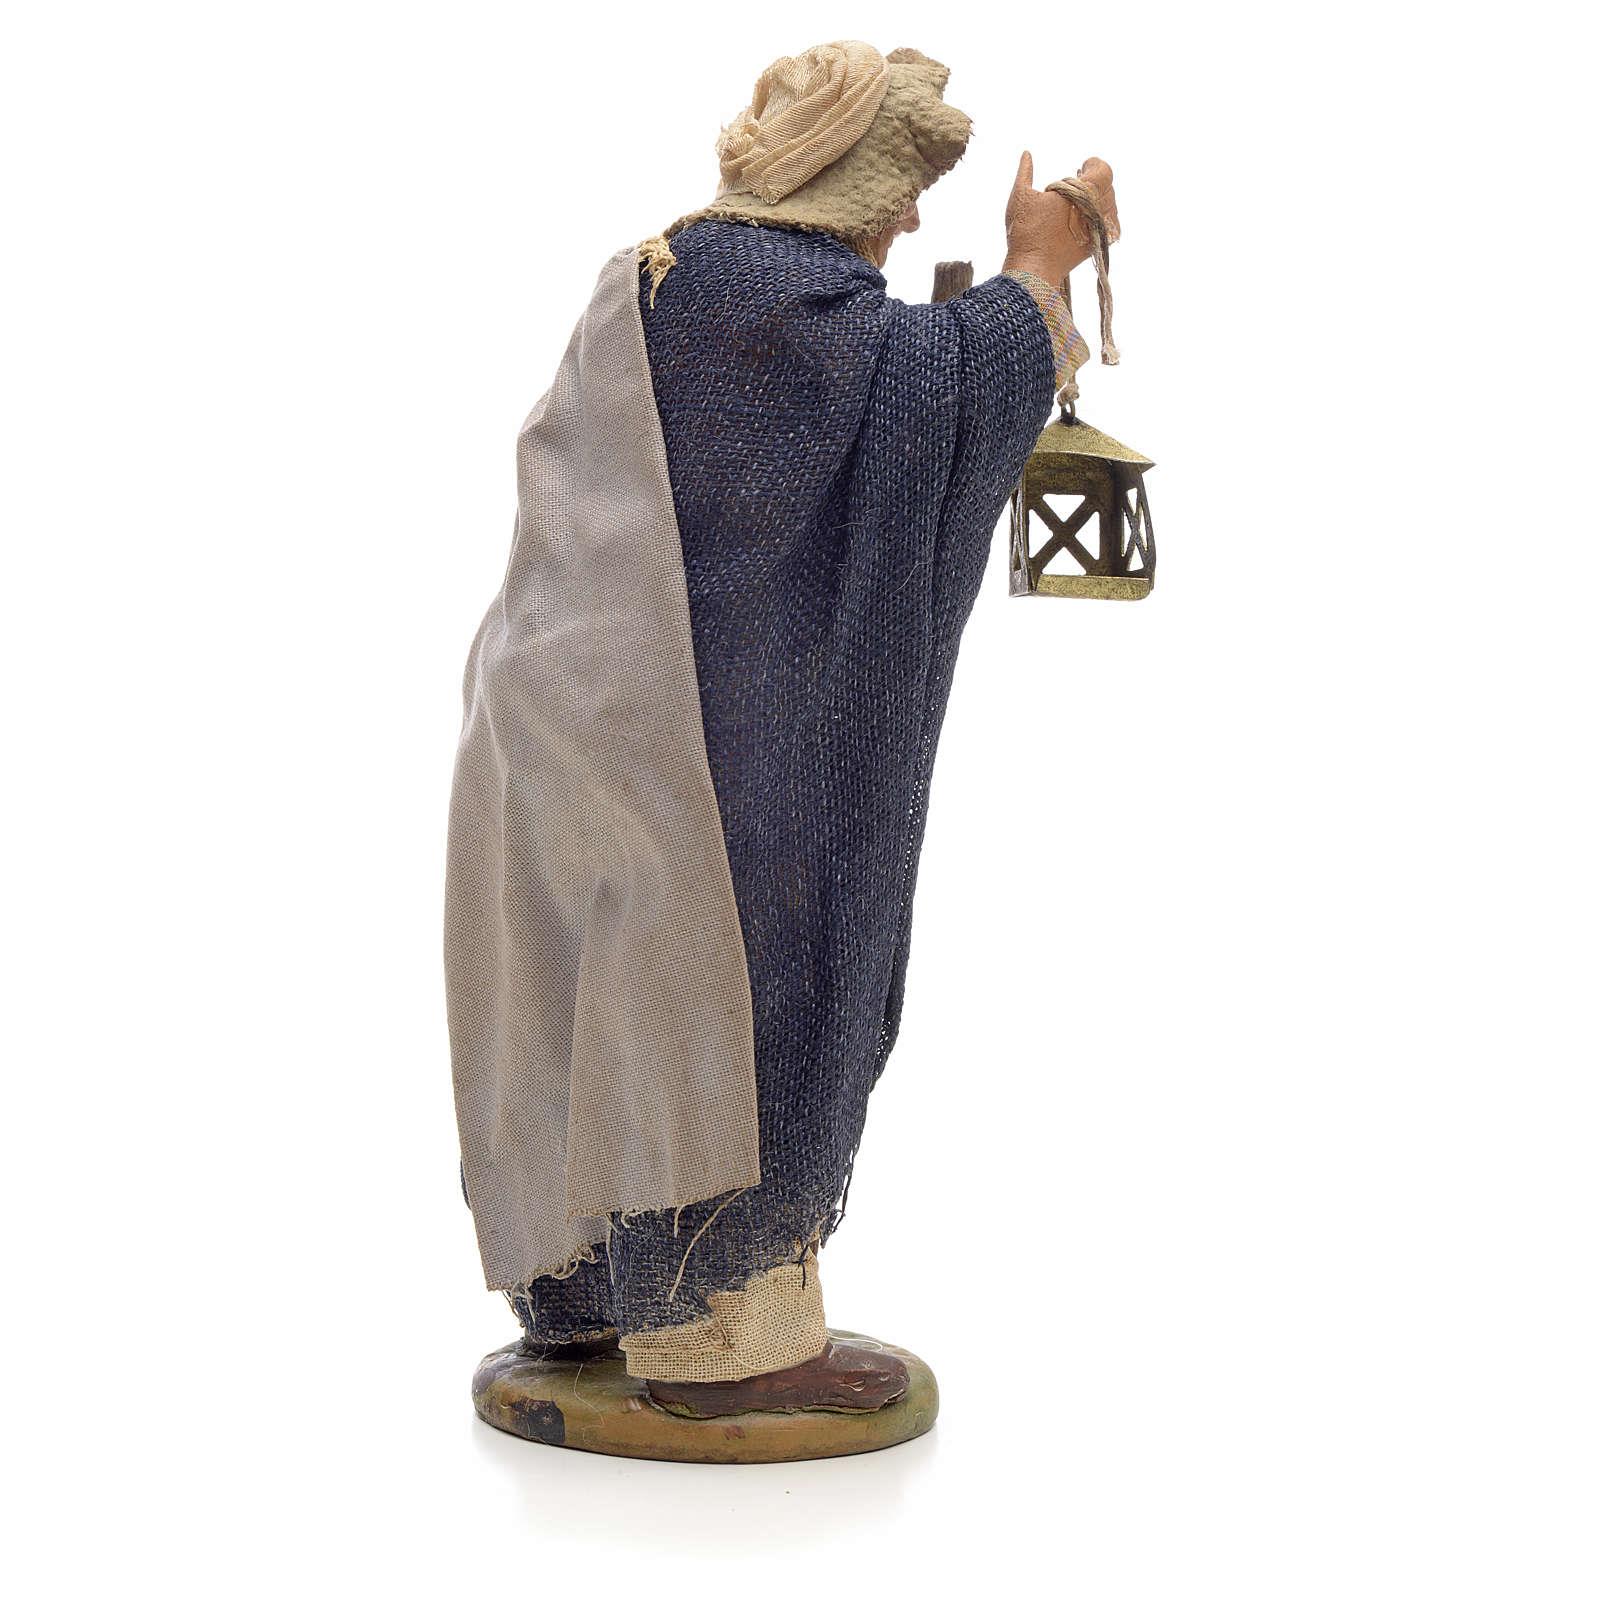 Uomo con lanterna e bastone 14 cm presepe Napoli 4